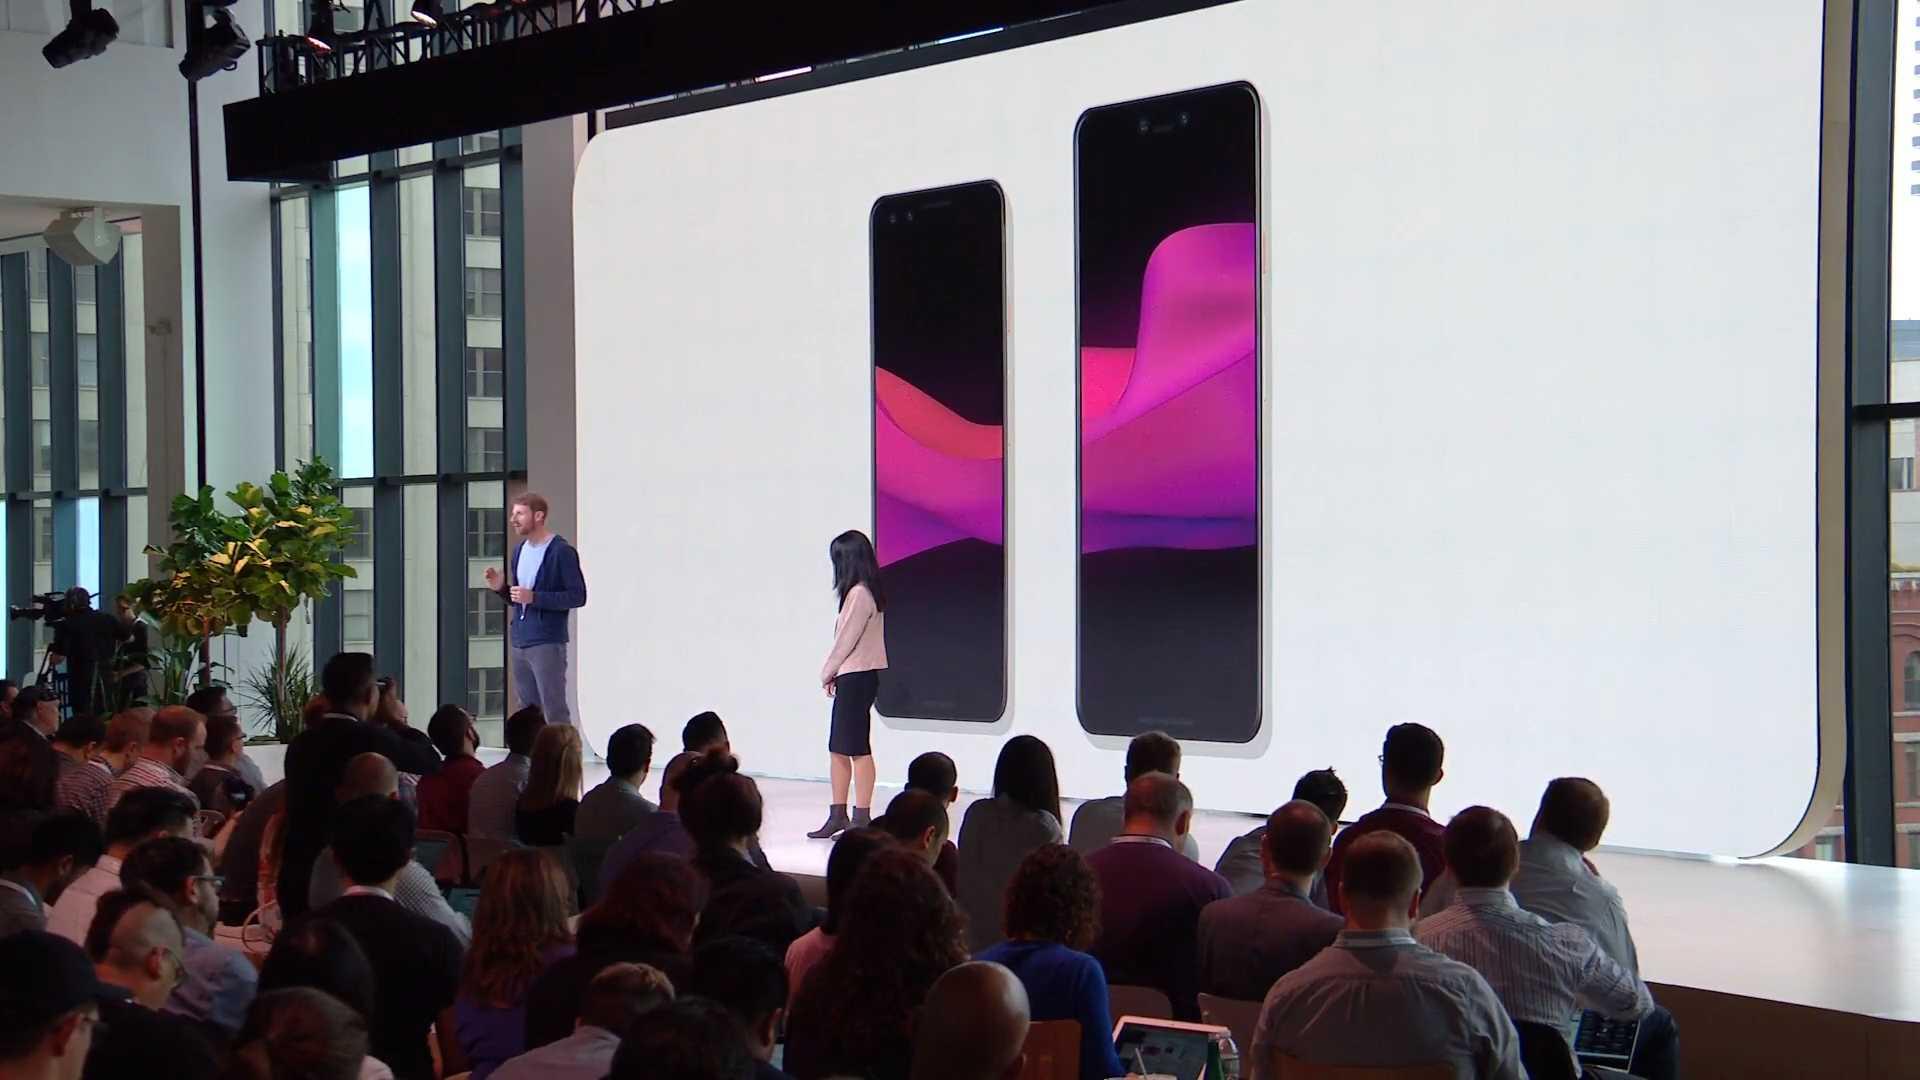 Google презентует pixel 5 и pixel 4a 5g на презентации 30 сентября, но это не точно - телеграф